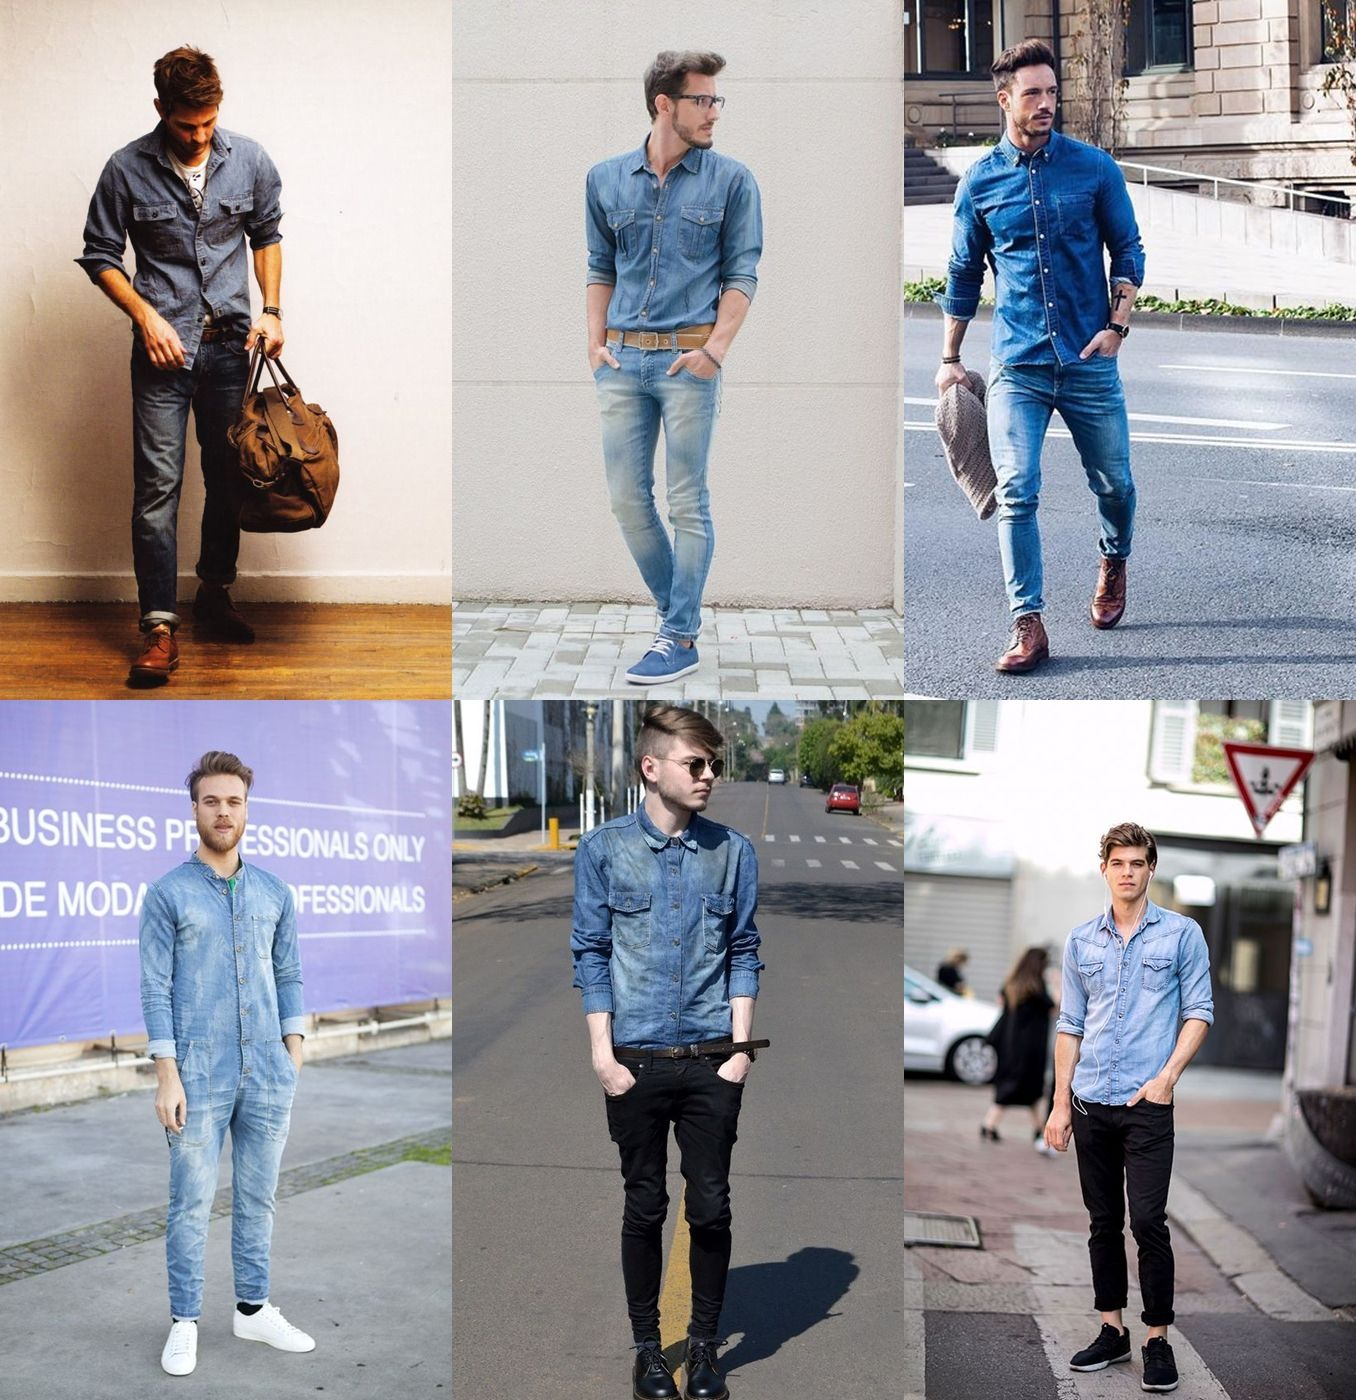 ... -como-usar-jeans-como-usar-camisa-jeans-moda-jeans-tendencia-masculina -menswear-dicas-de-moda-alex-cursino-blog-de-moda-mens-moda-sem-censura -4-tile 1cddb0cf91